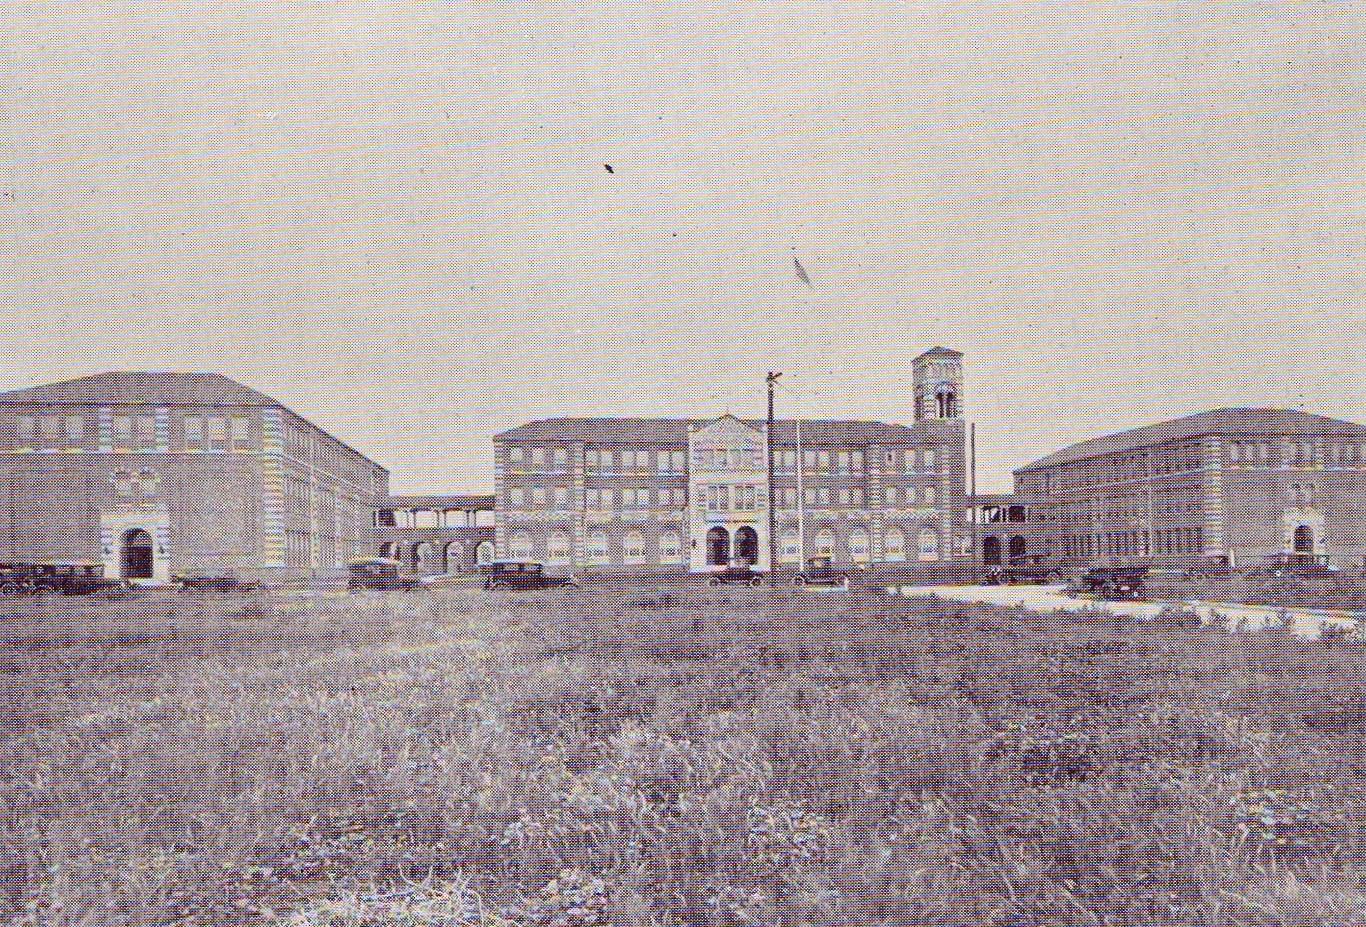 Garfield High 1925 - No houses